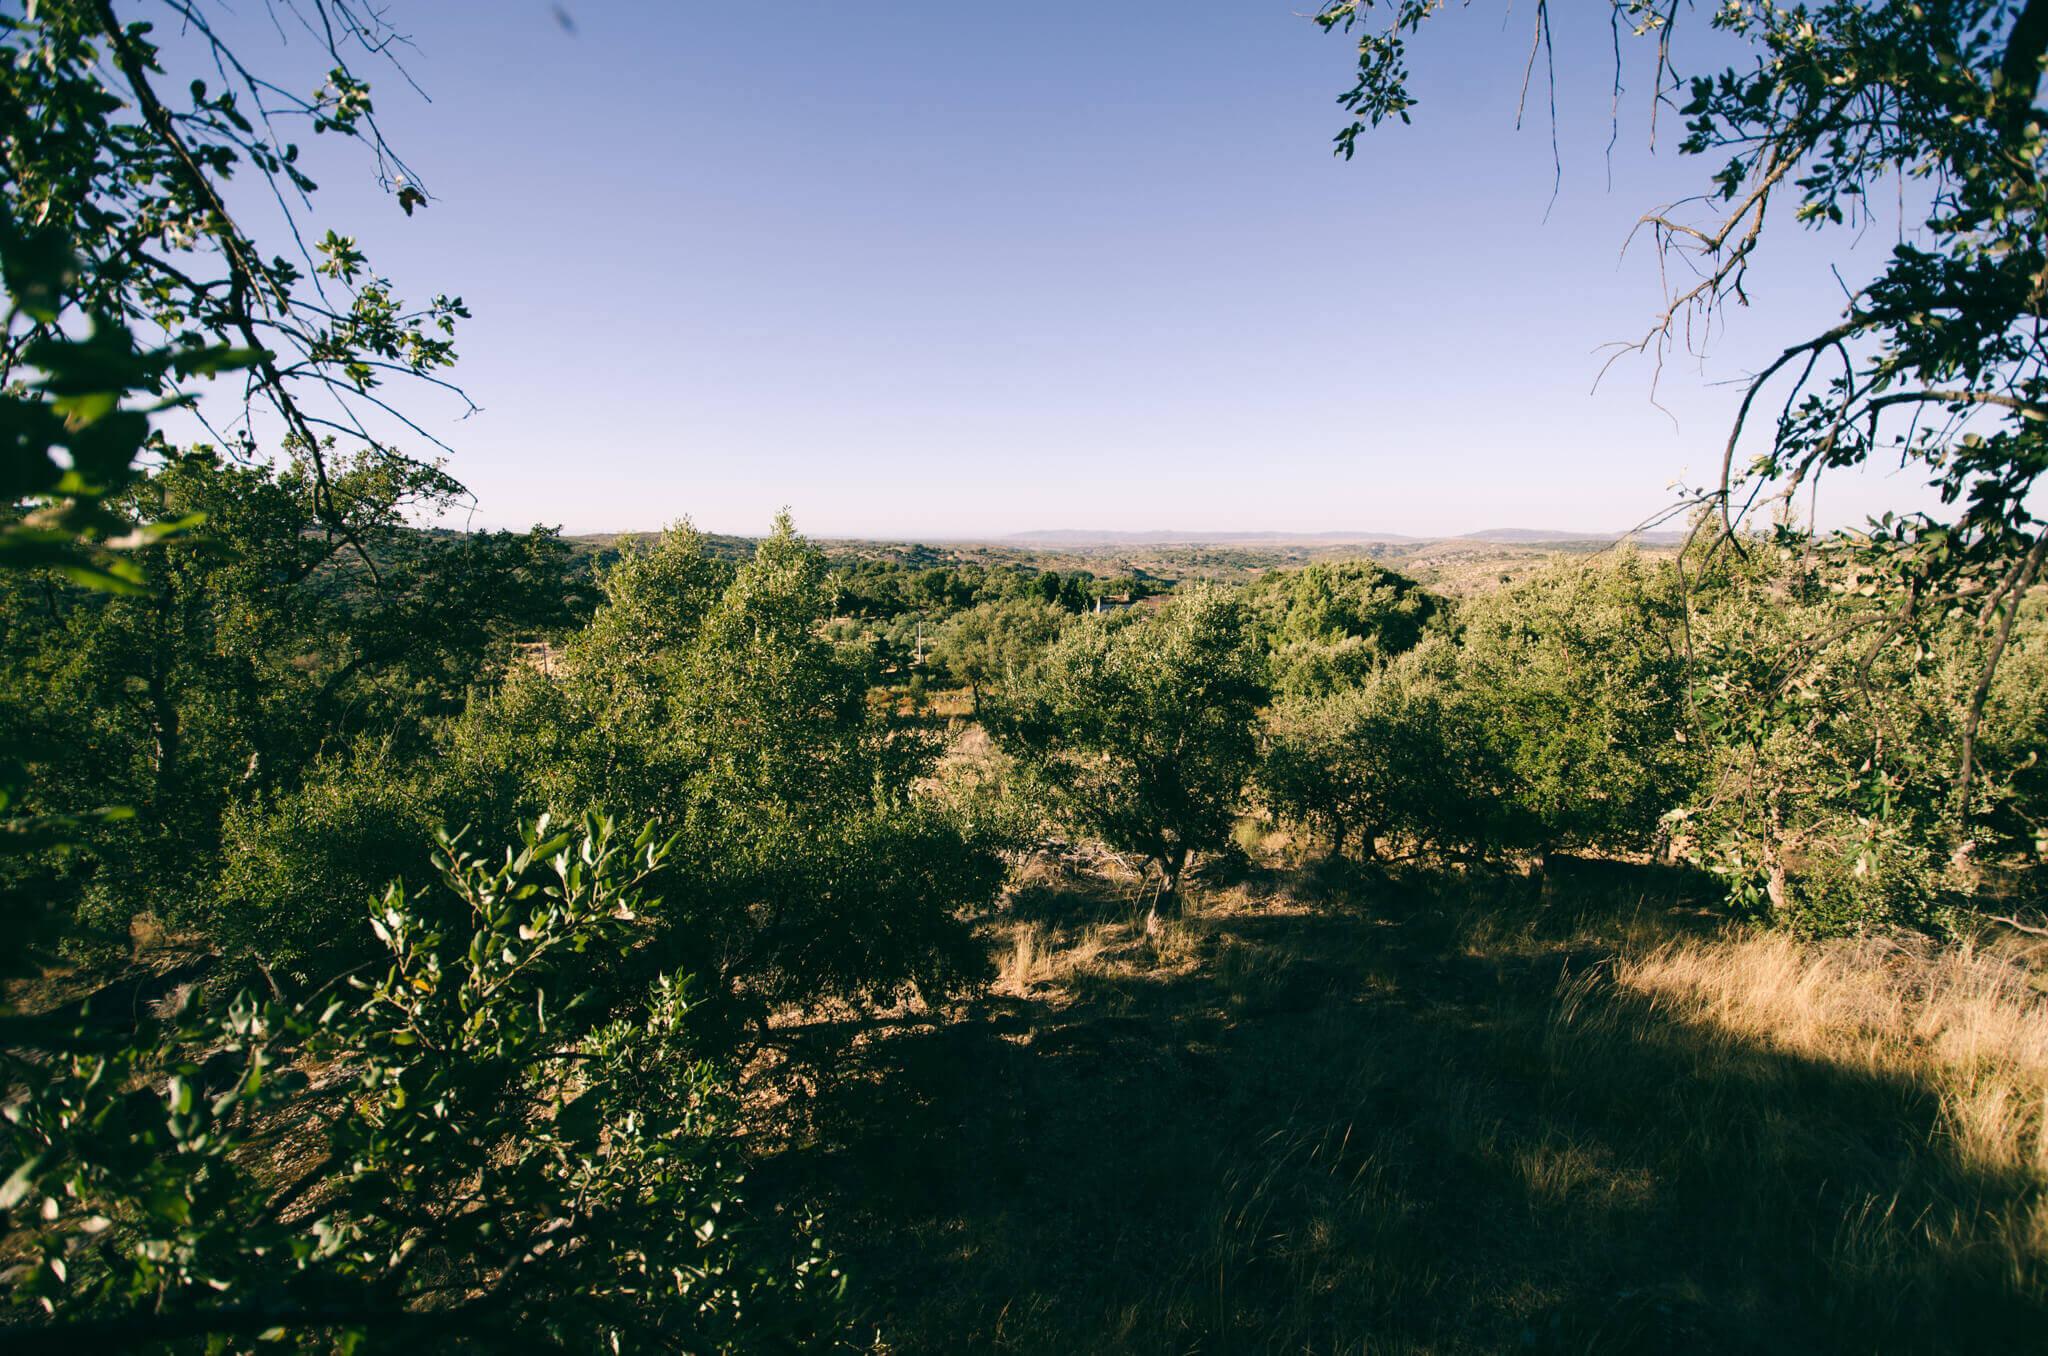 alentejo-landscape-breathe-portugal.jpg